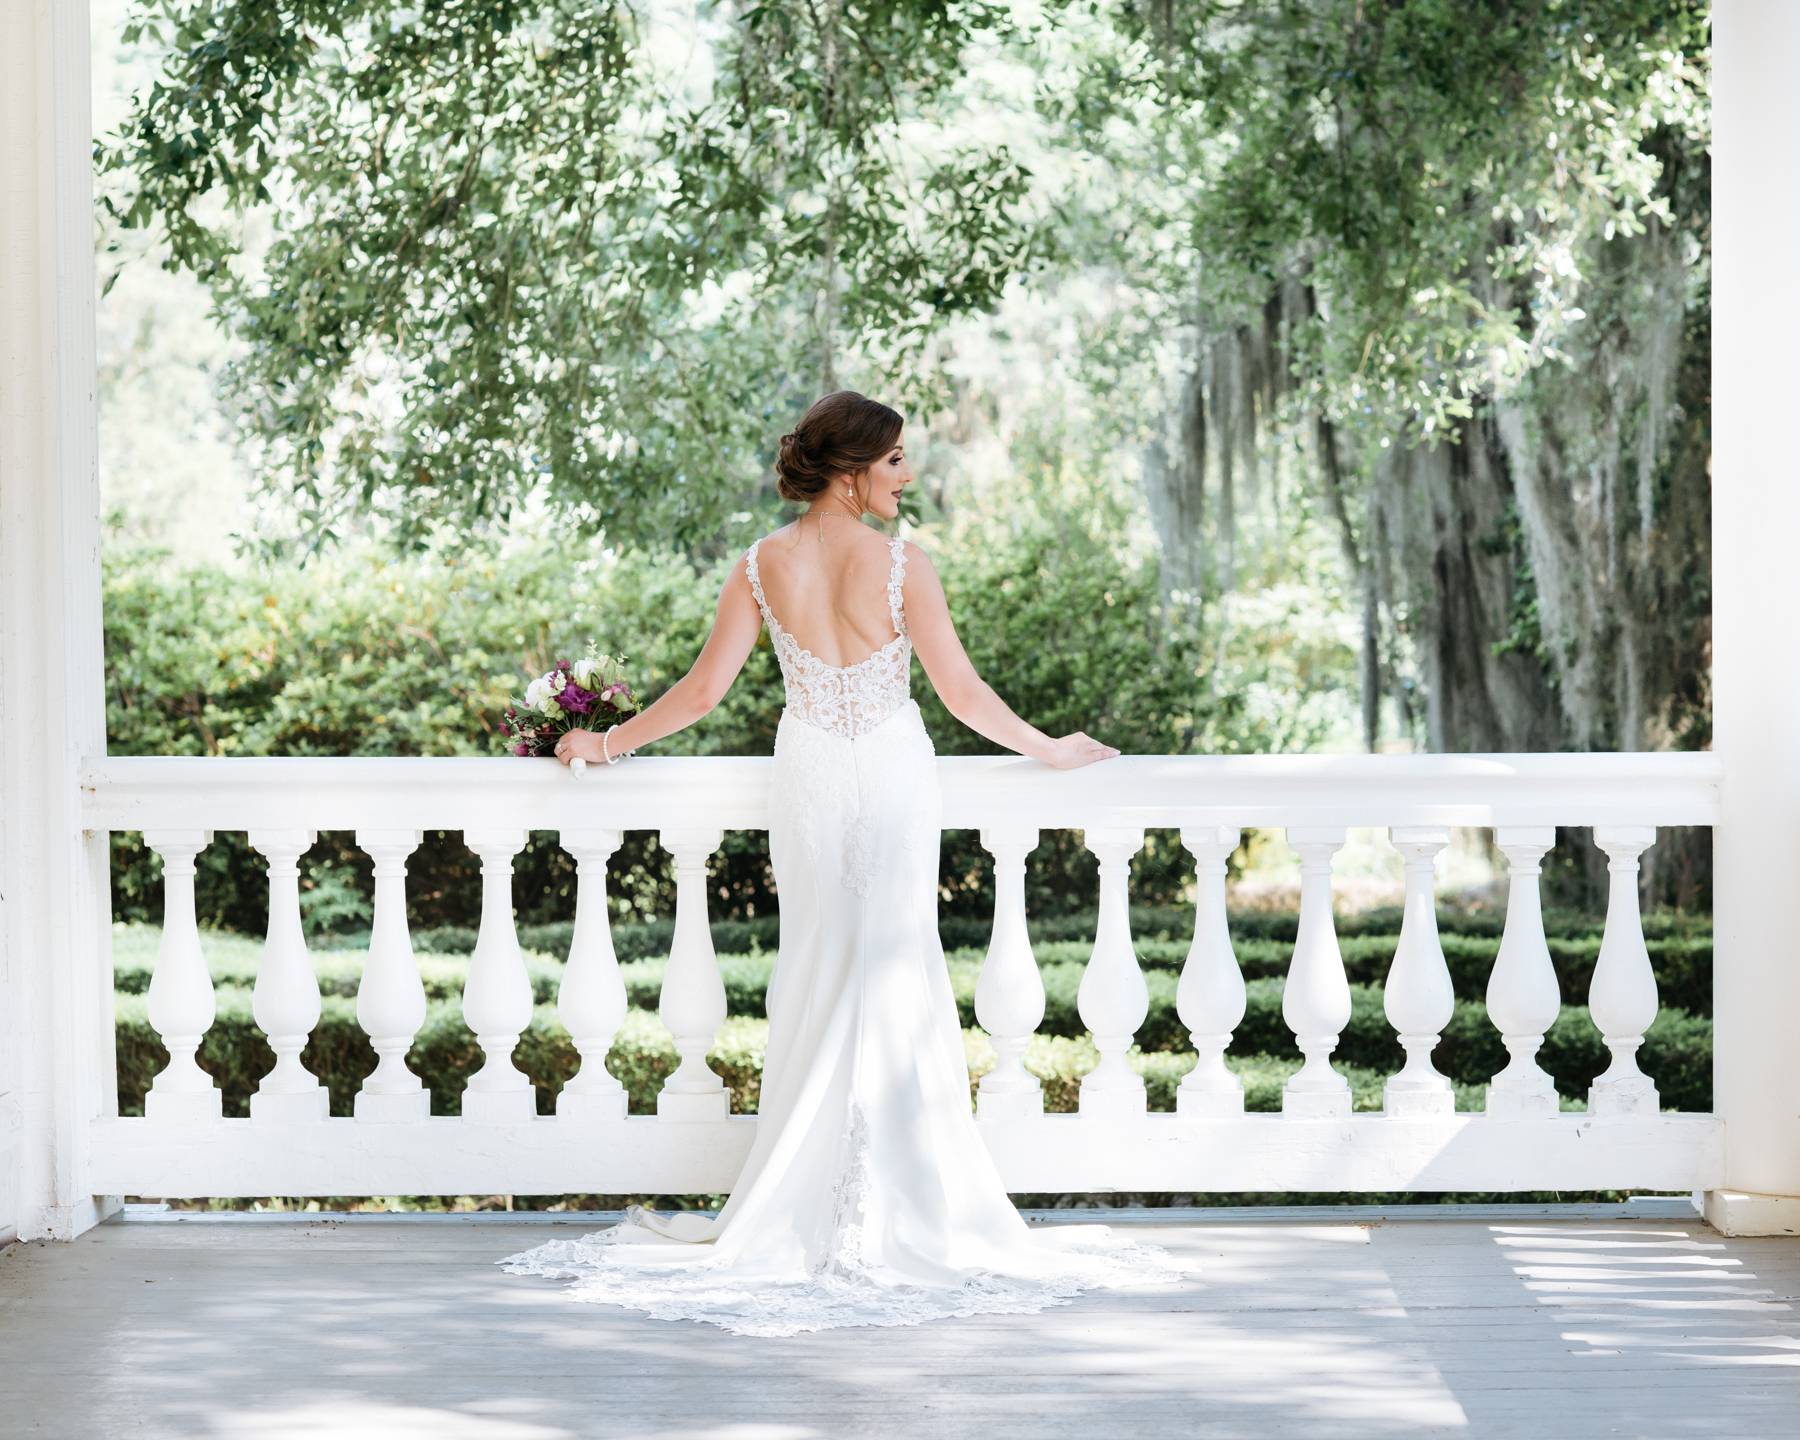 baton-rouge-wedding-photographer-2-2.jpg